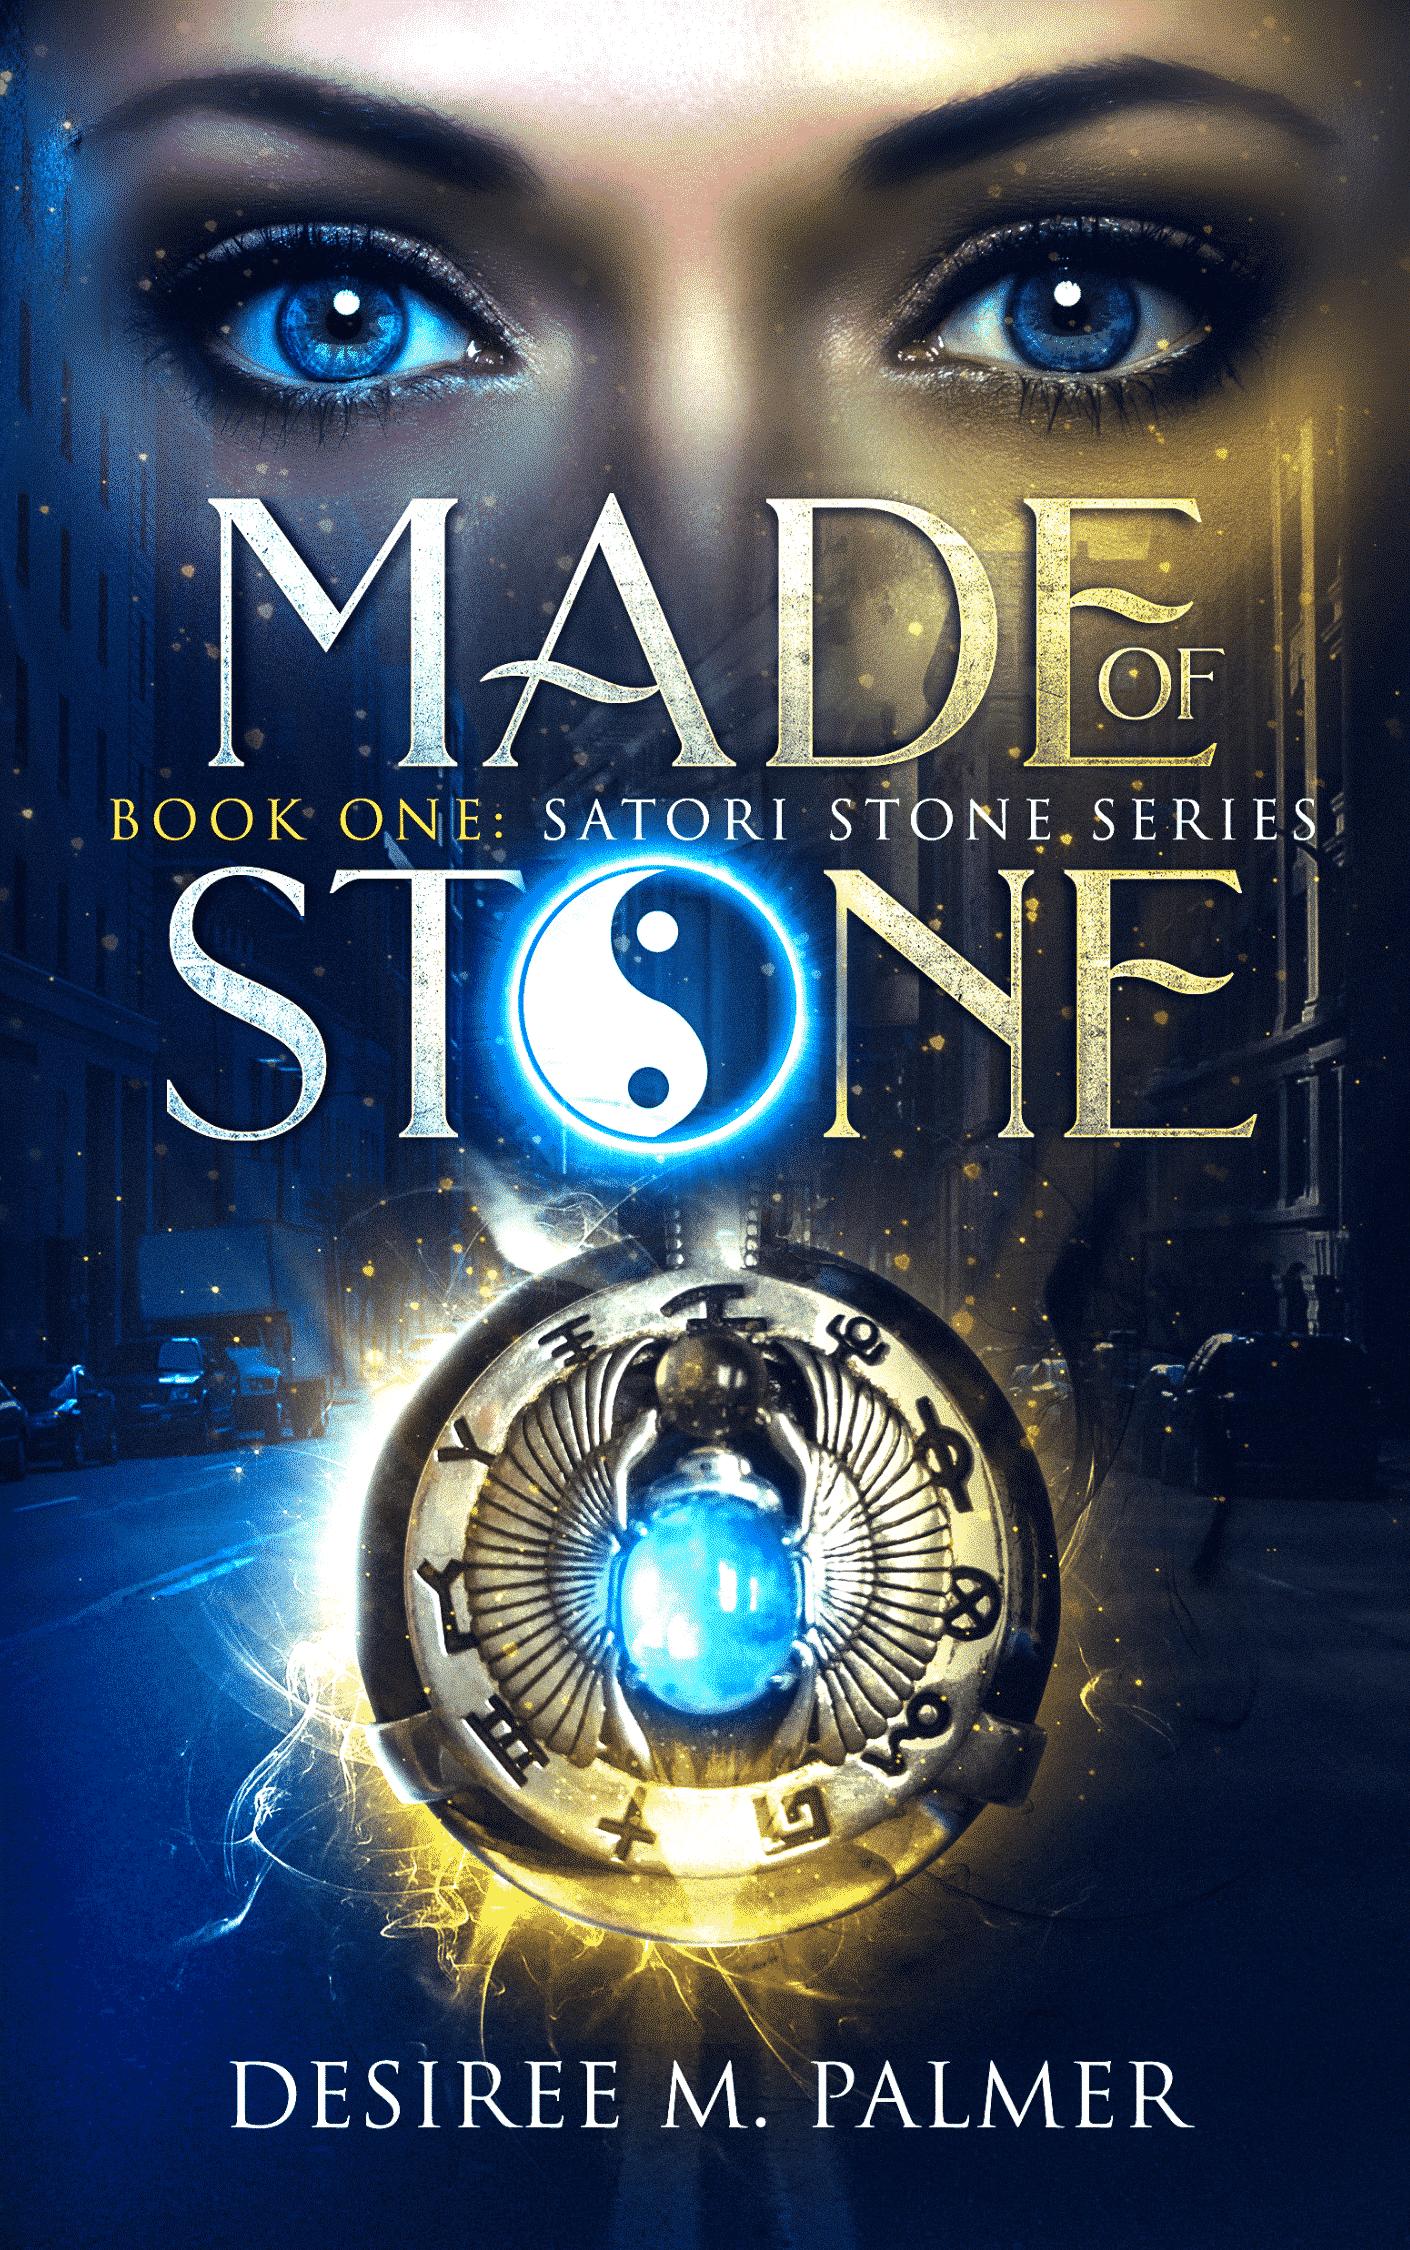 MADE OF STONE E BOOK COVER